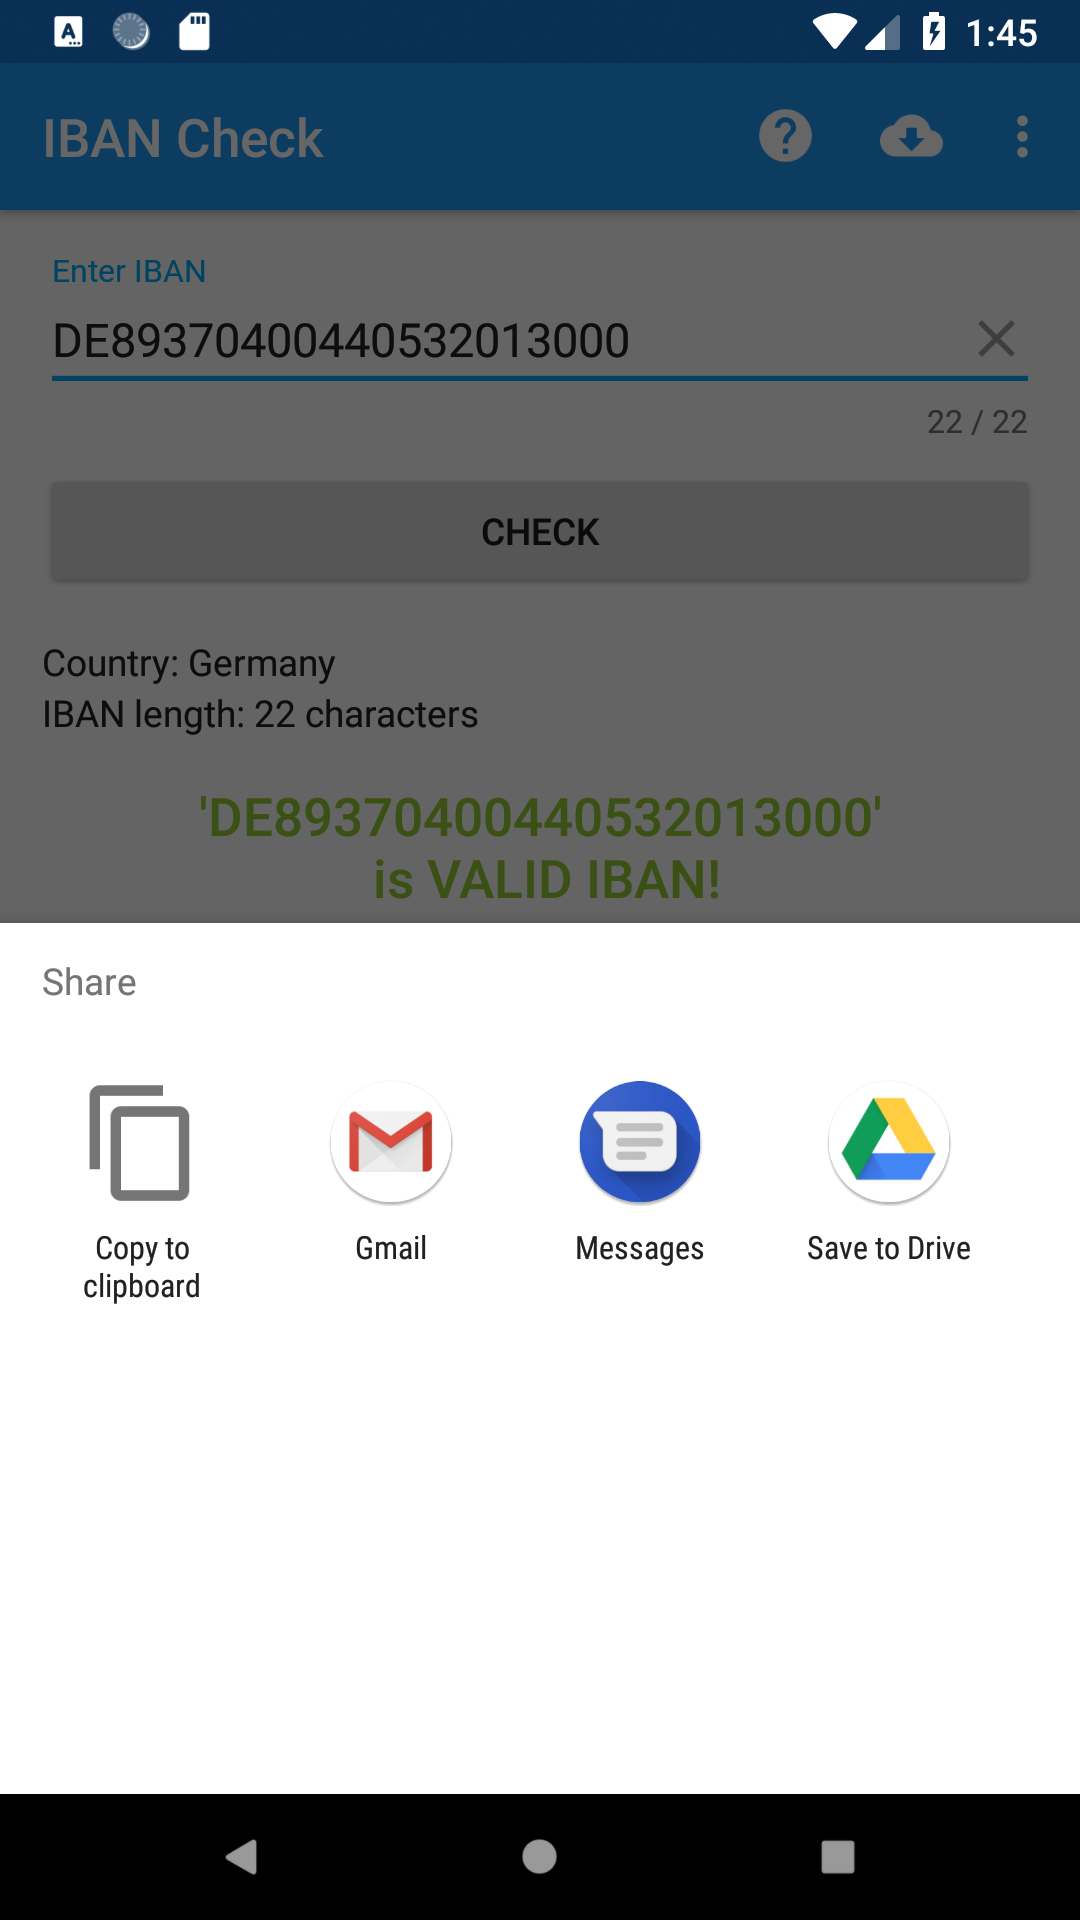 VMSoft » IBAN Check